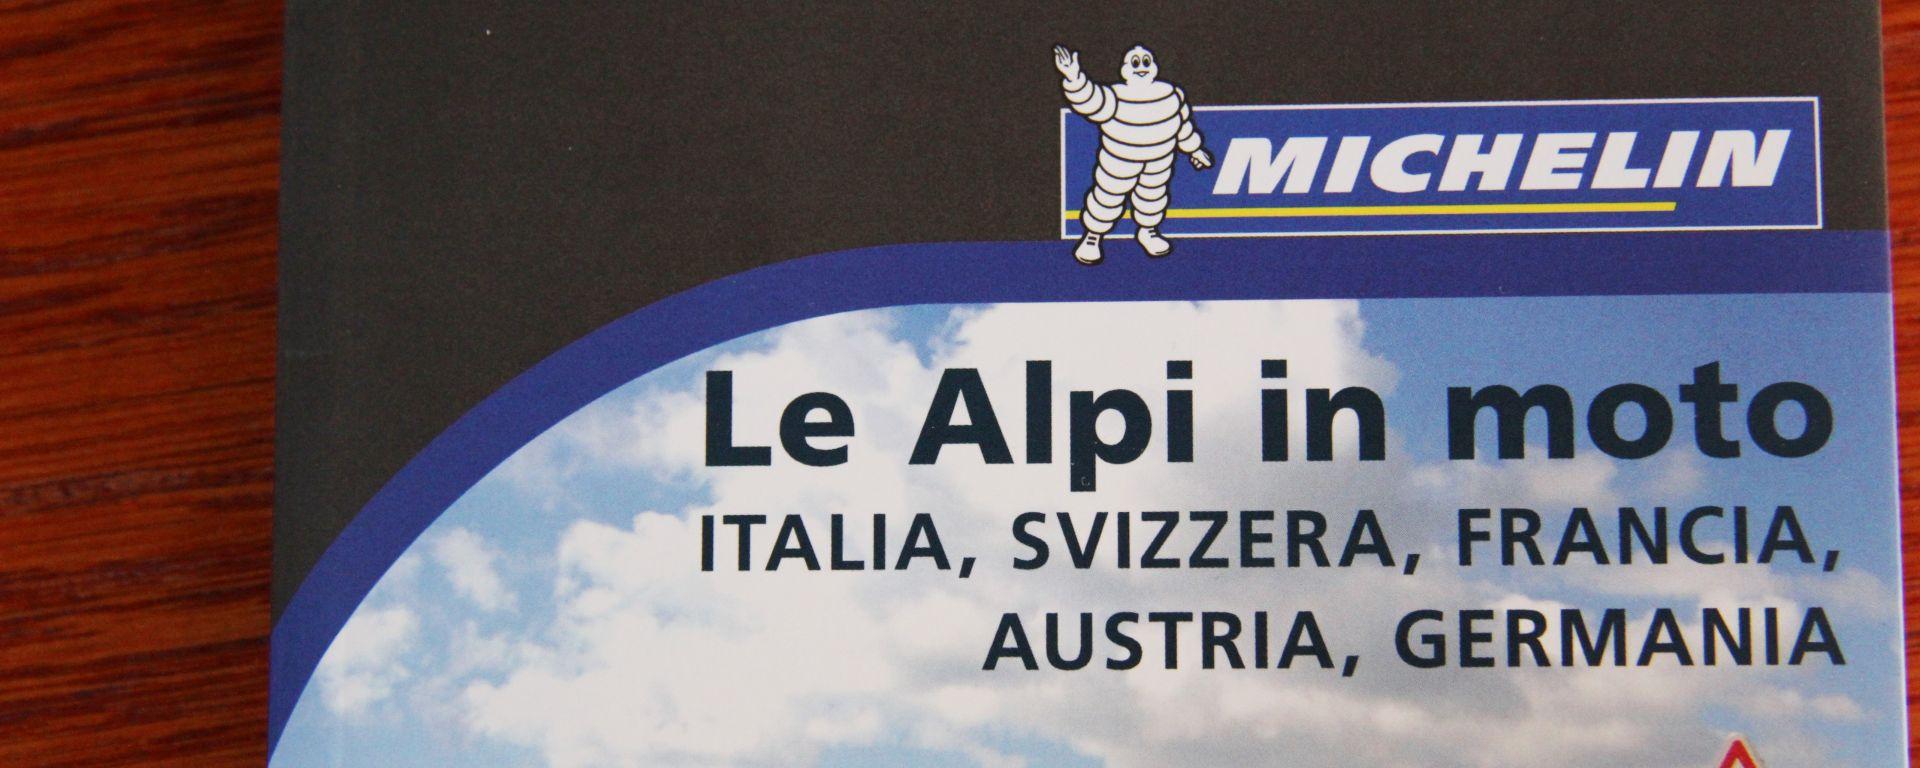 Michelin: Le Alpi in Moto e 90 virées à moto